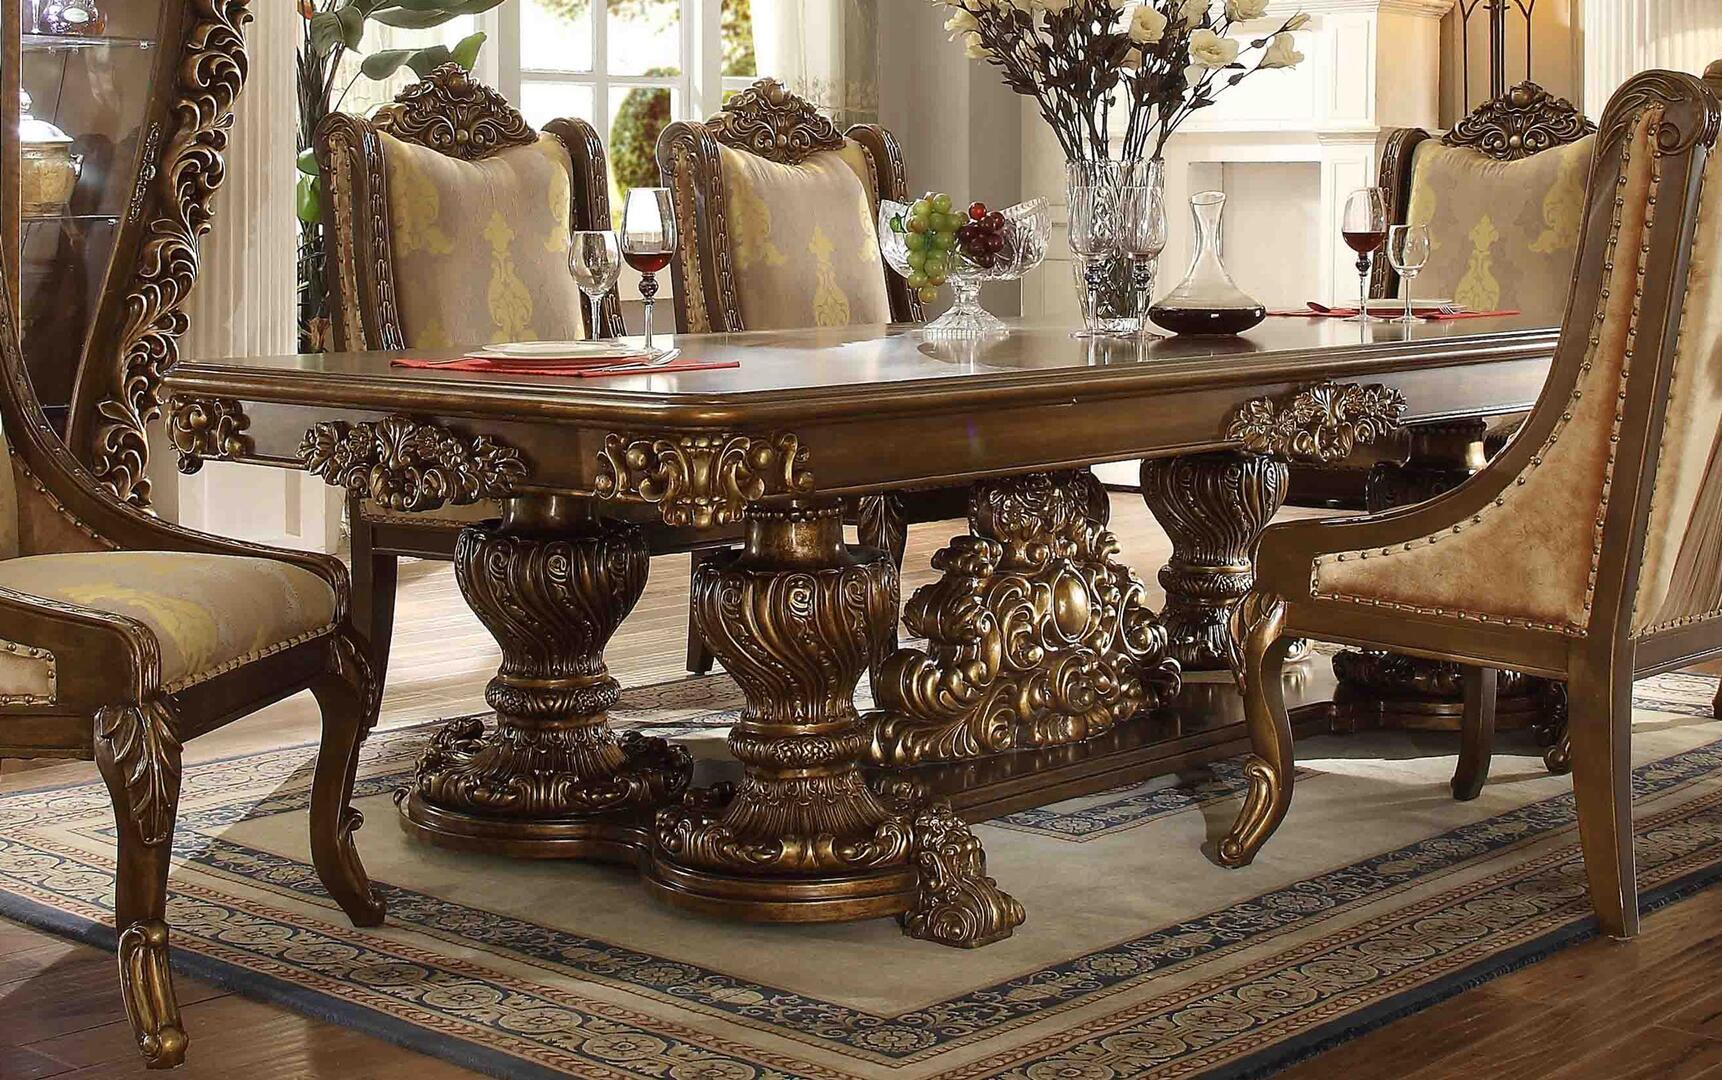 Homey Design Hd 8011 Dining Table Hd8011diningtable Golden Walnut